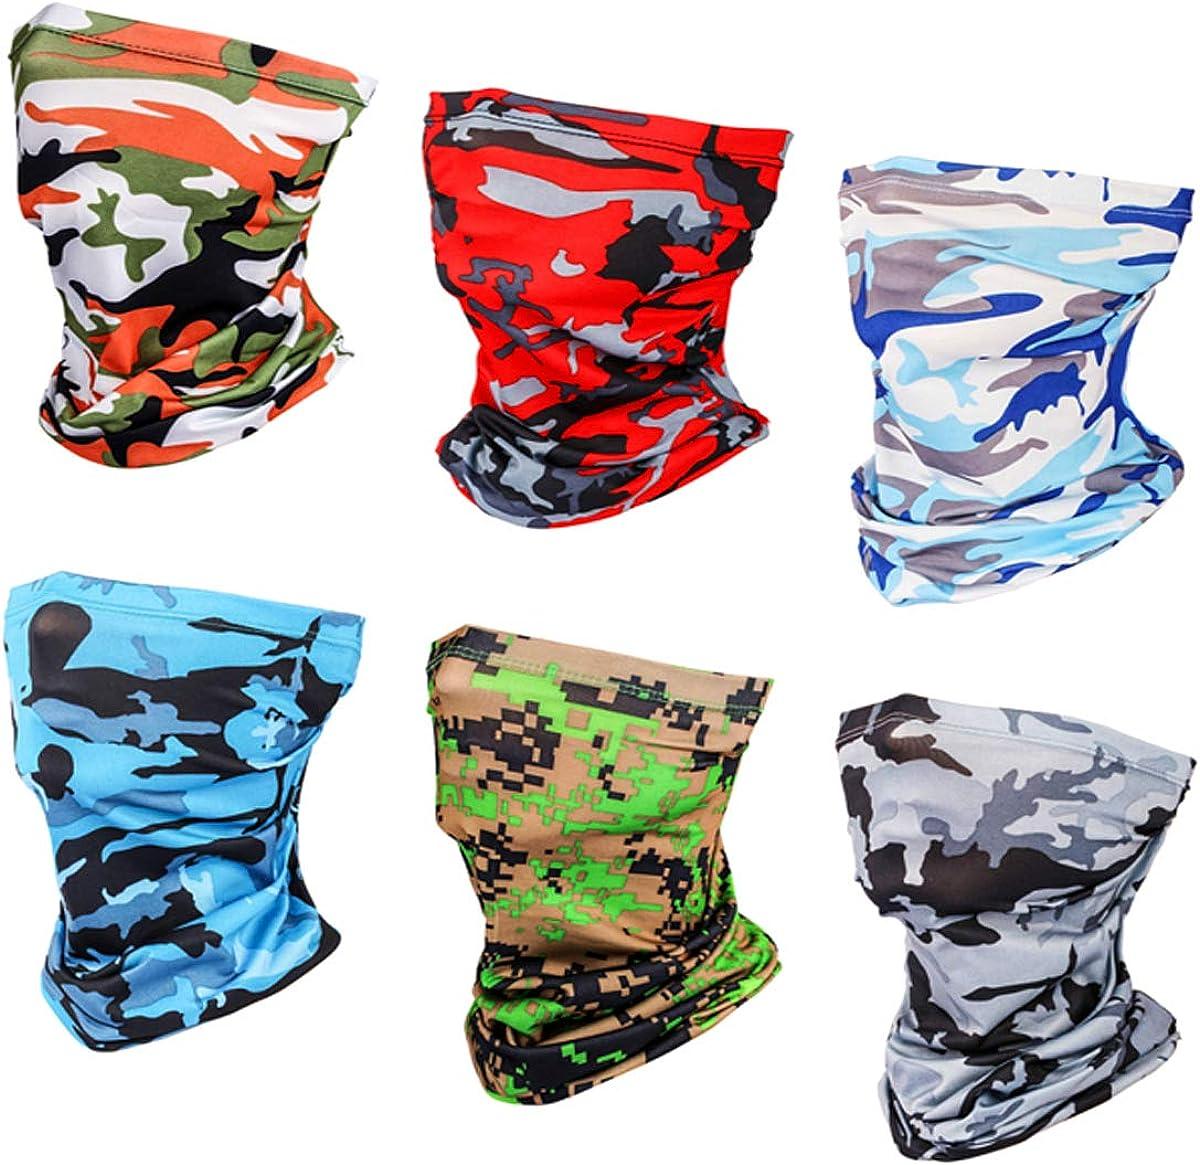 6 Pieces Sun UV Protection Face Mask Cooling Neck Gaiter Balaclava Bandana Scarf